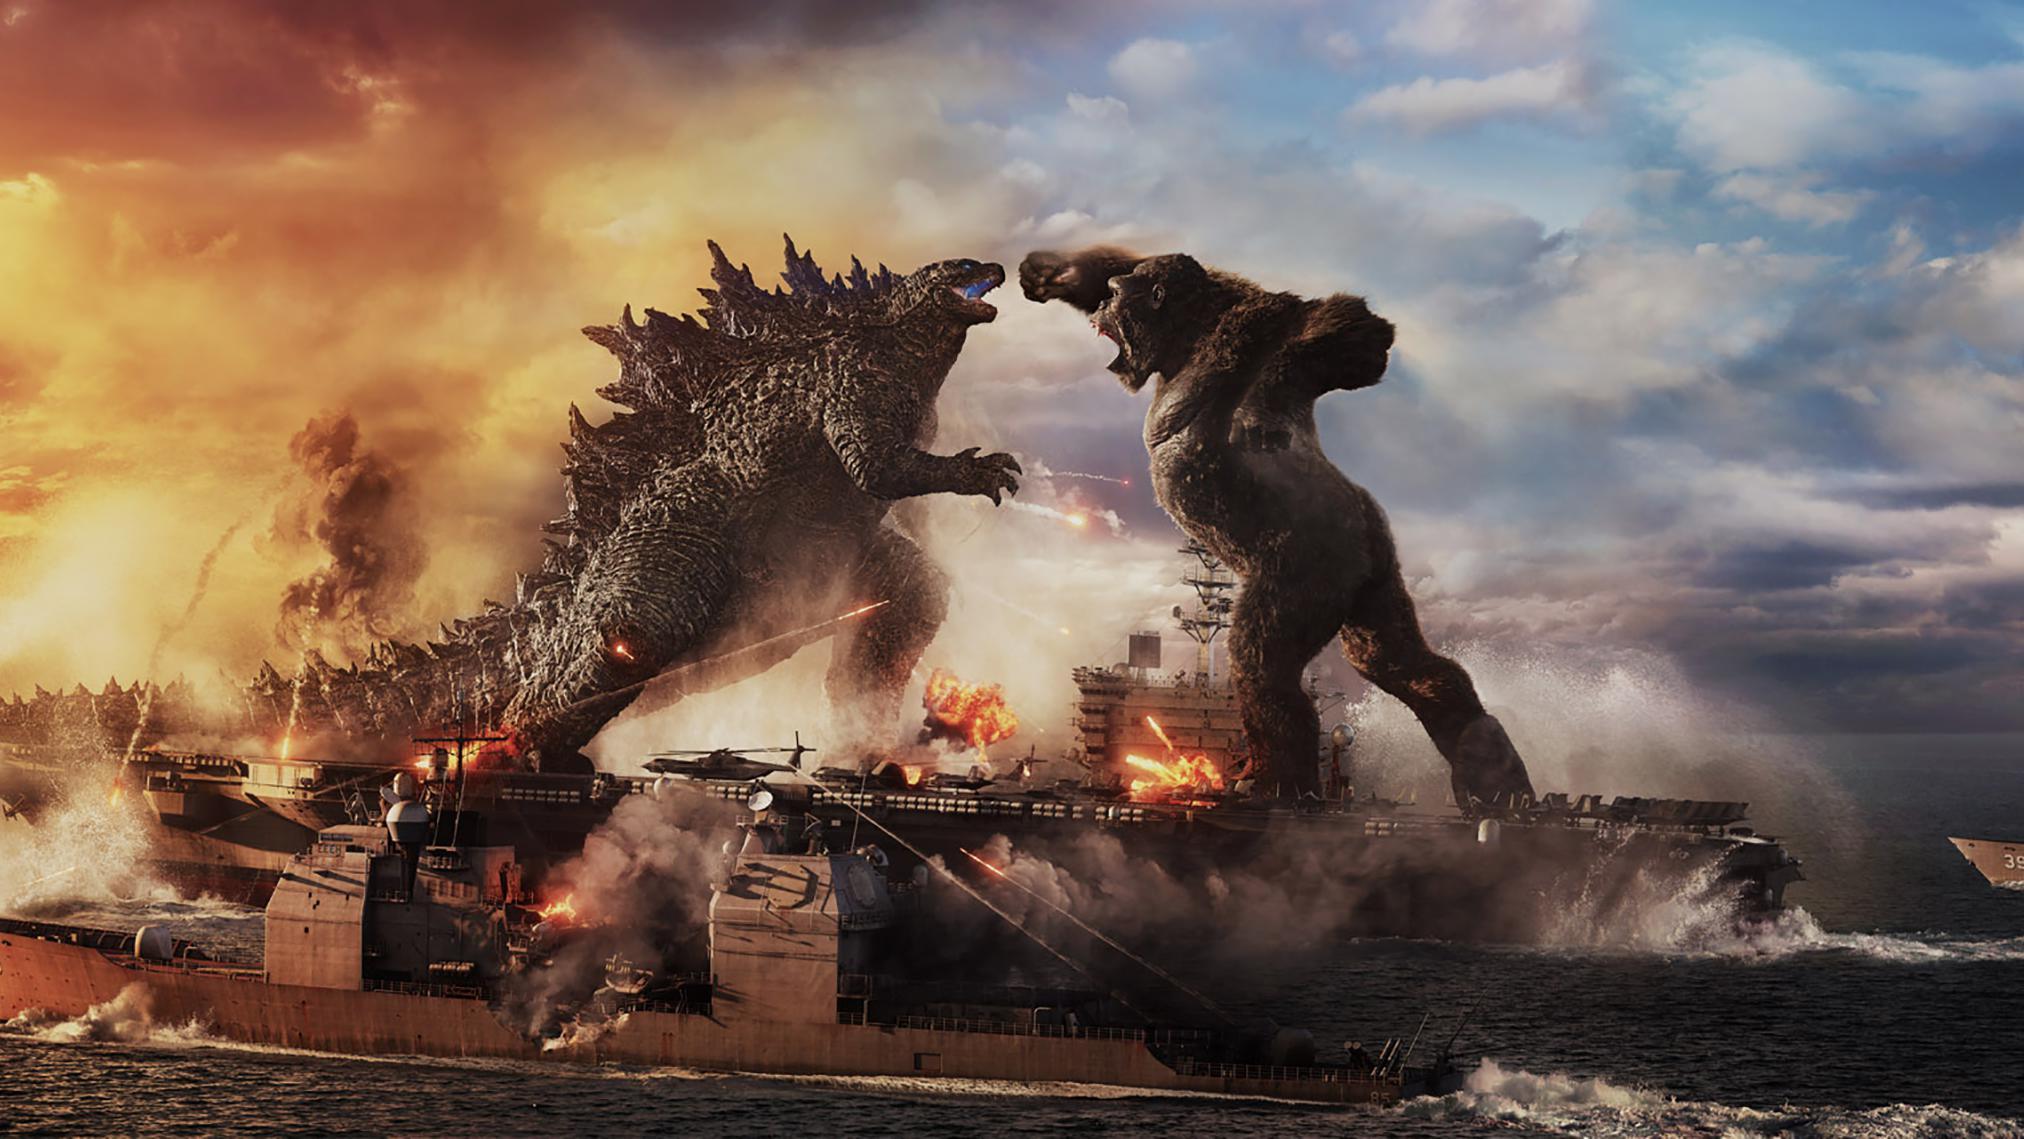 Godzilla vs. Kong smashes revenue forecasts at the global box office